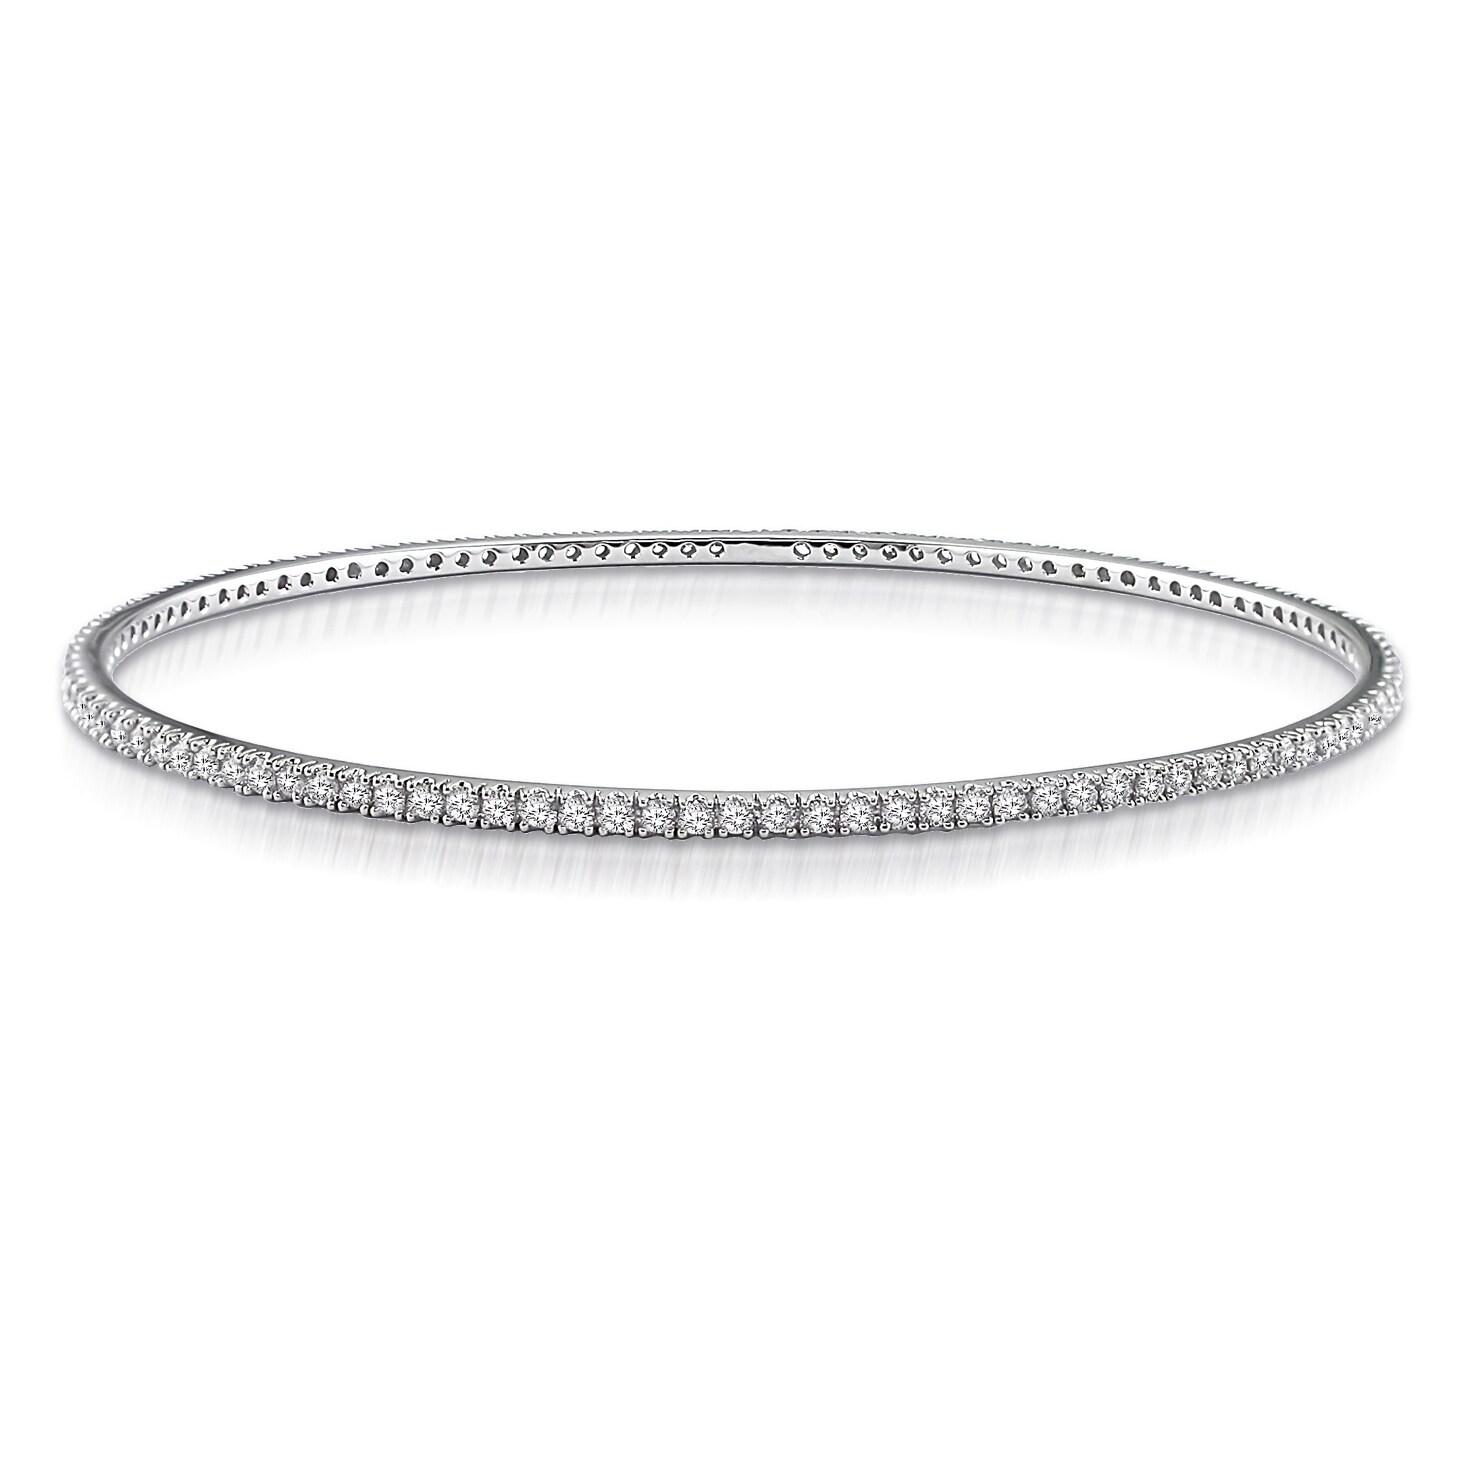 Women/'s Bangle Diamond Bracelet in 14k White Gold Finish 2.5 Carats